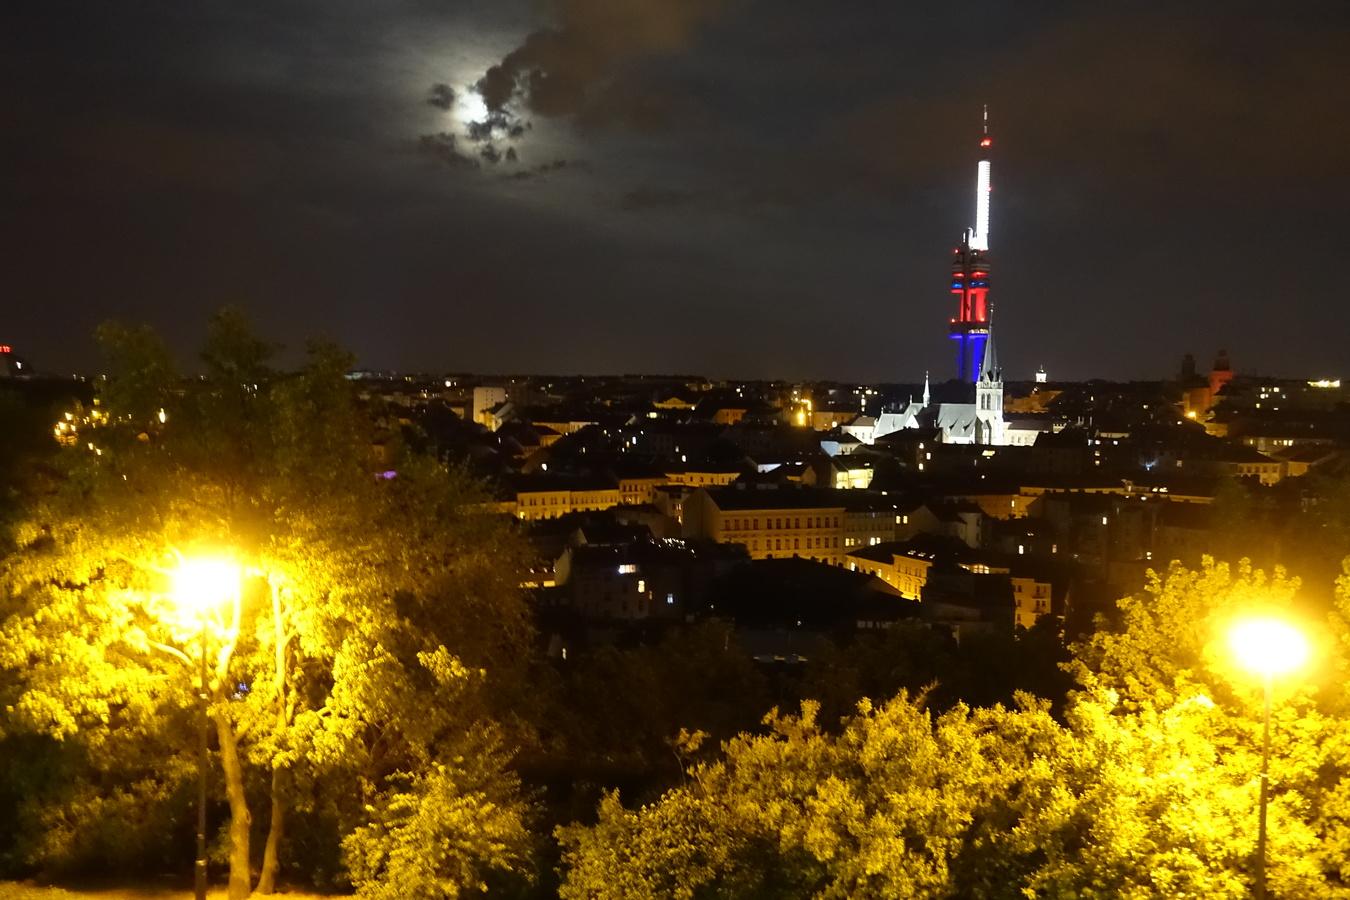 Noční Žižkov s TV věží